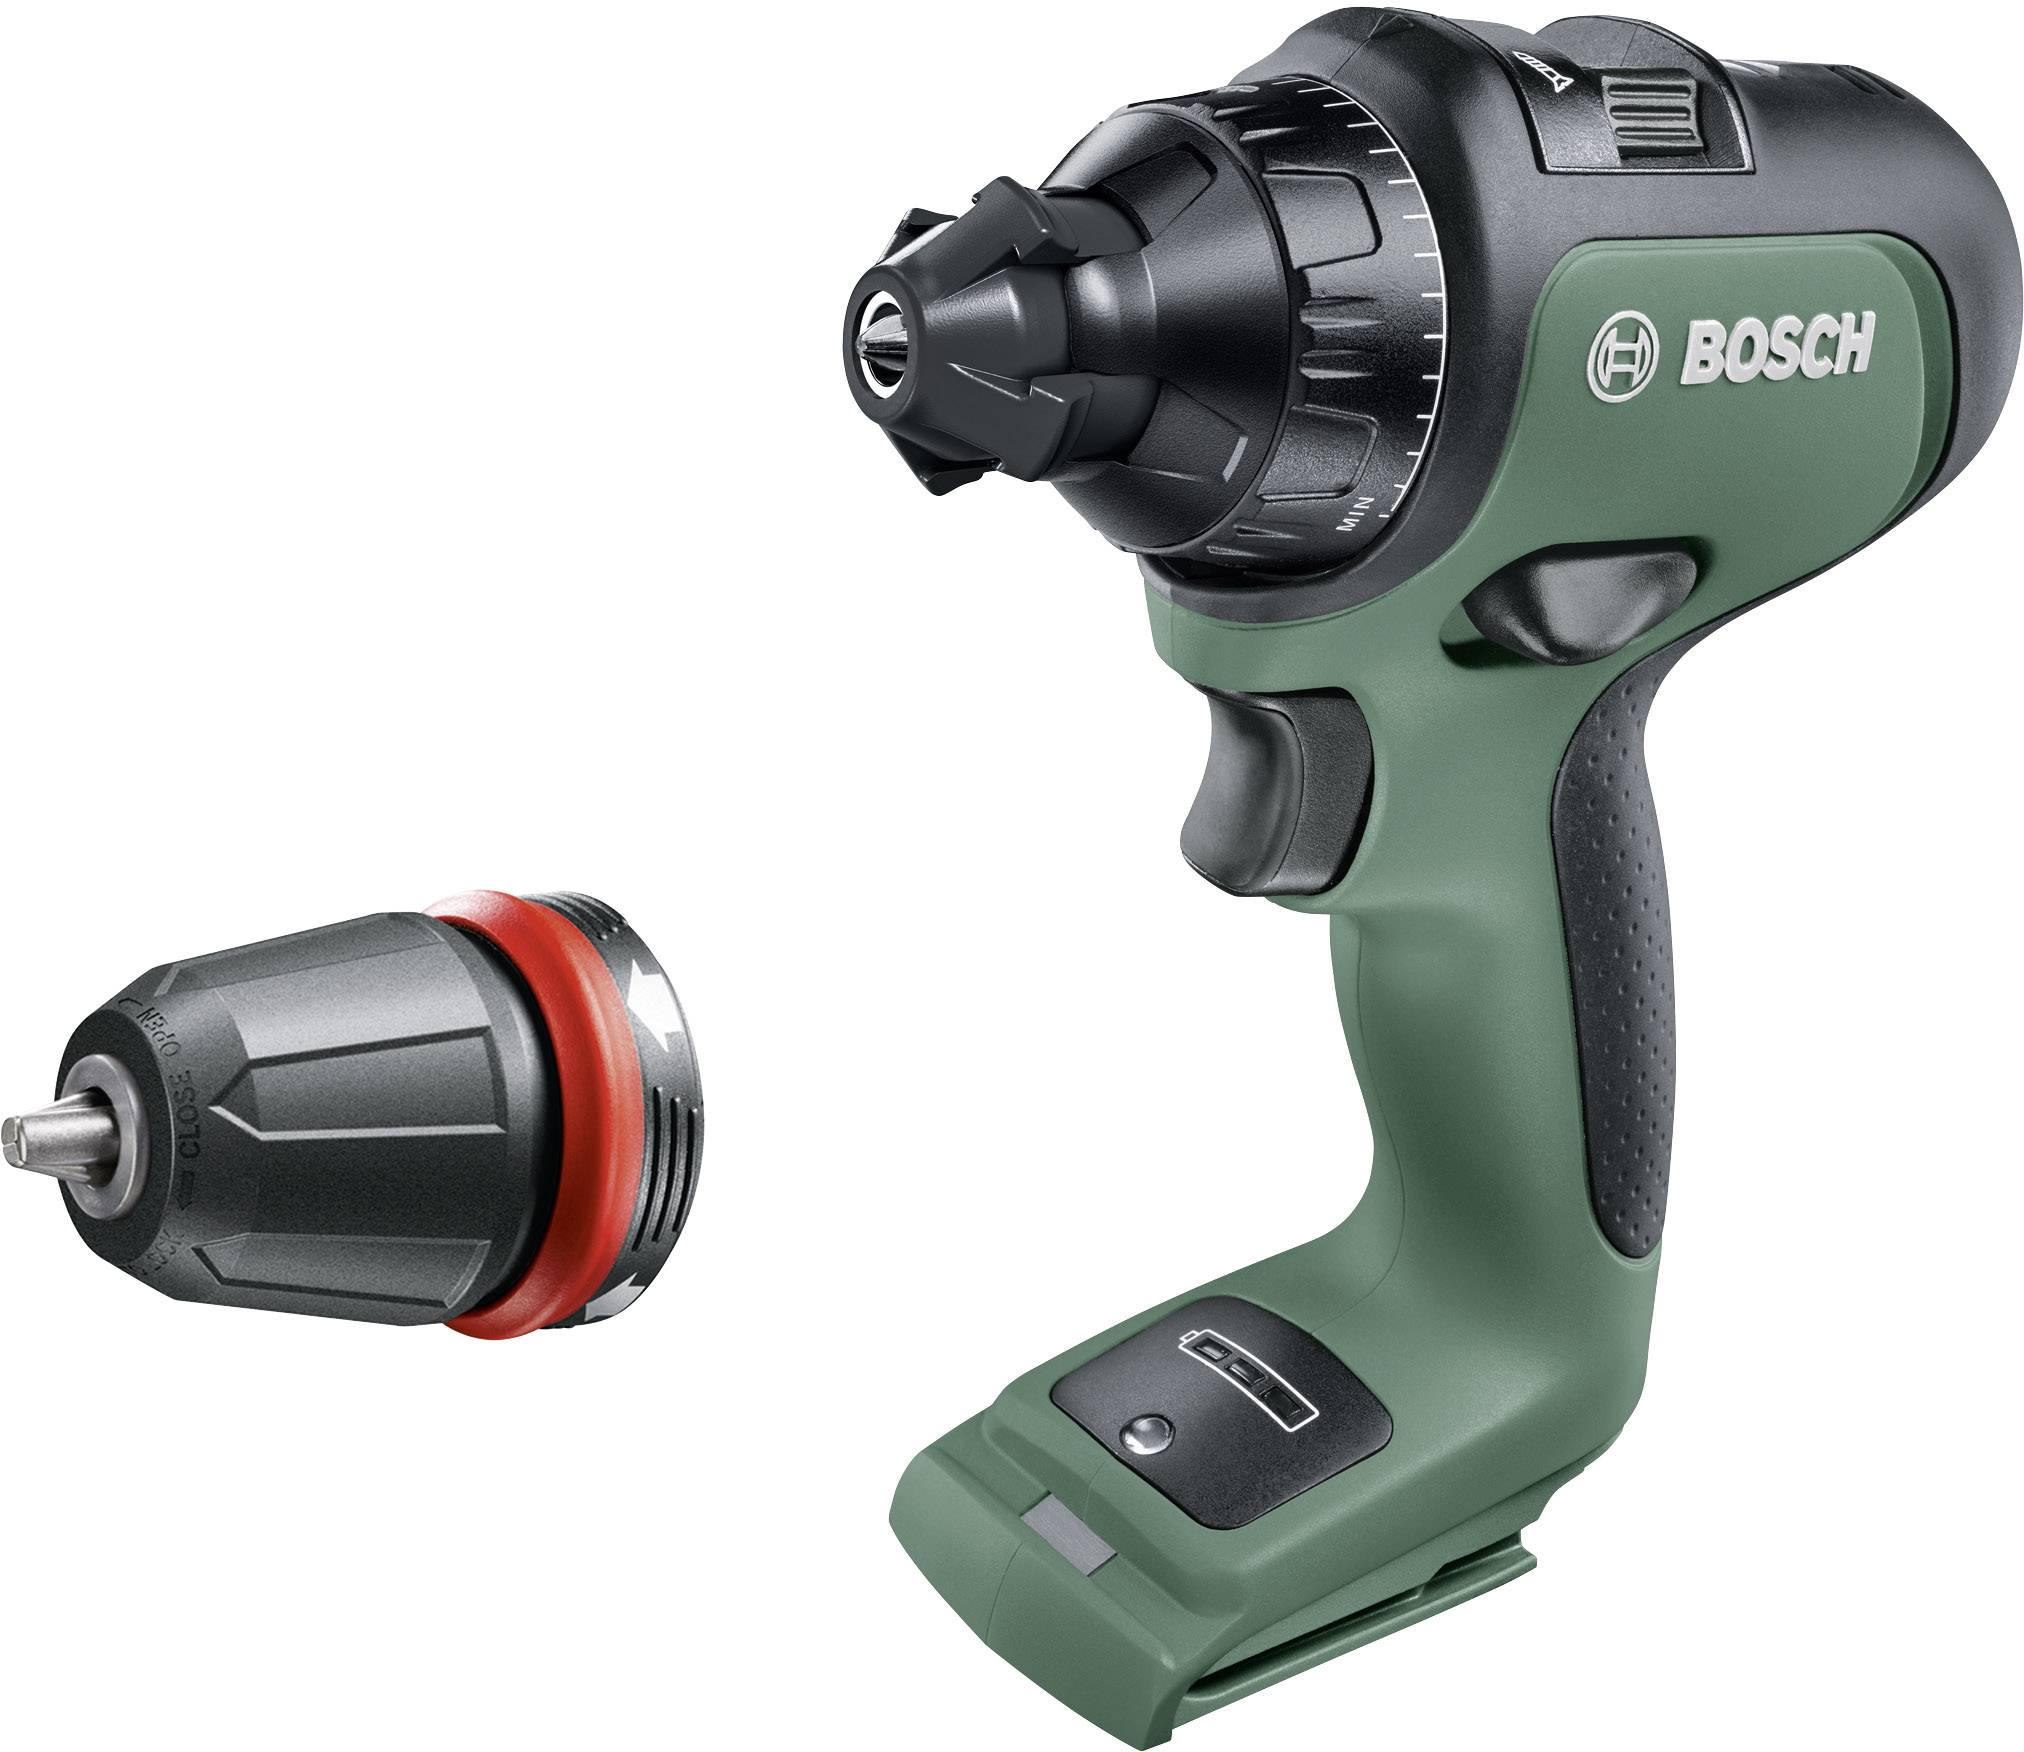 Bosch Home and Garden AdvancedDrill 18 Akku Bohrschrauber 18 V Li Ion ohne Akku